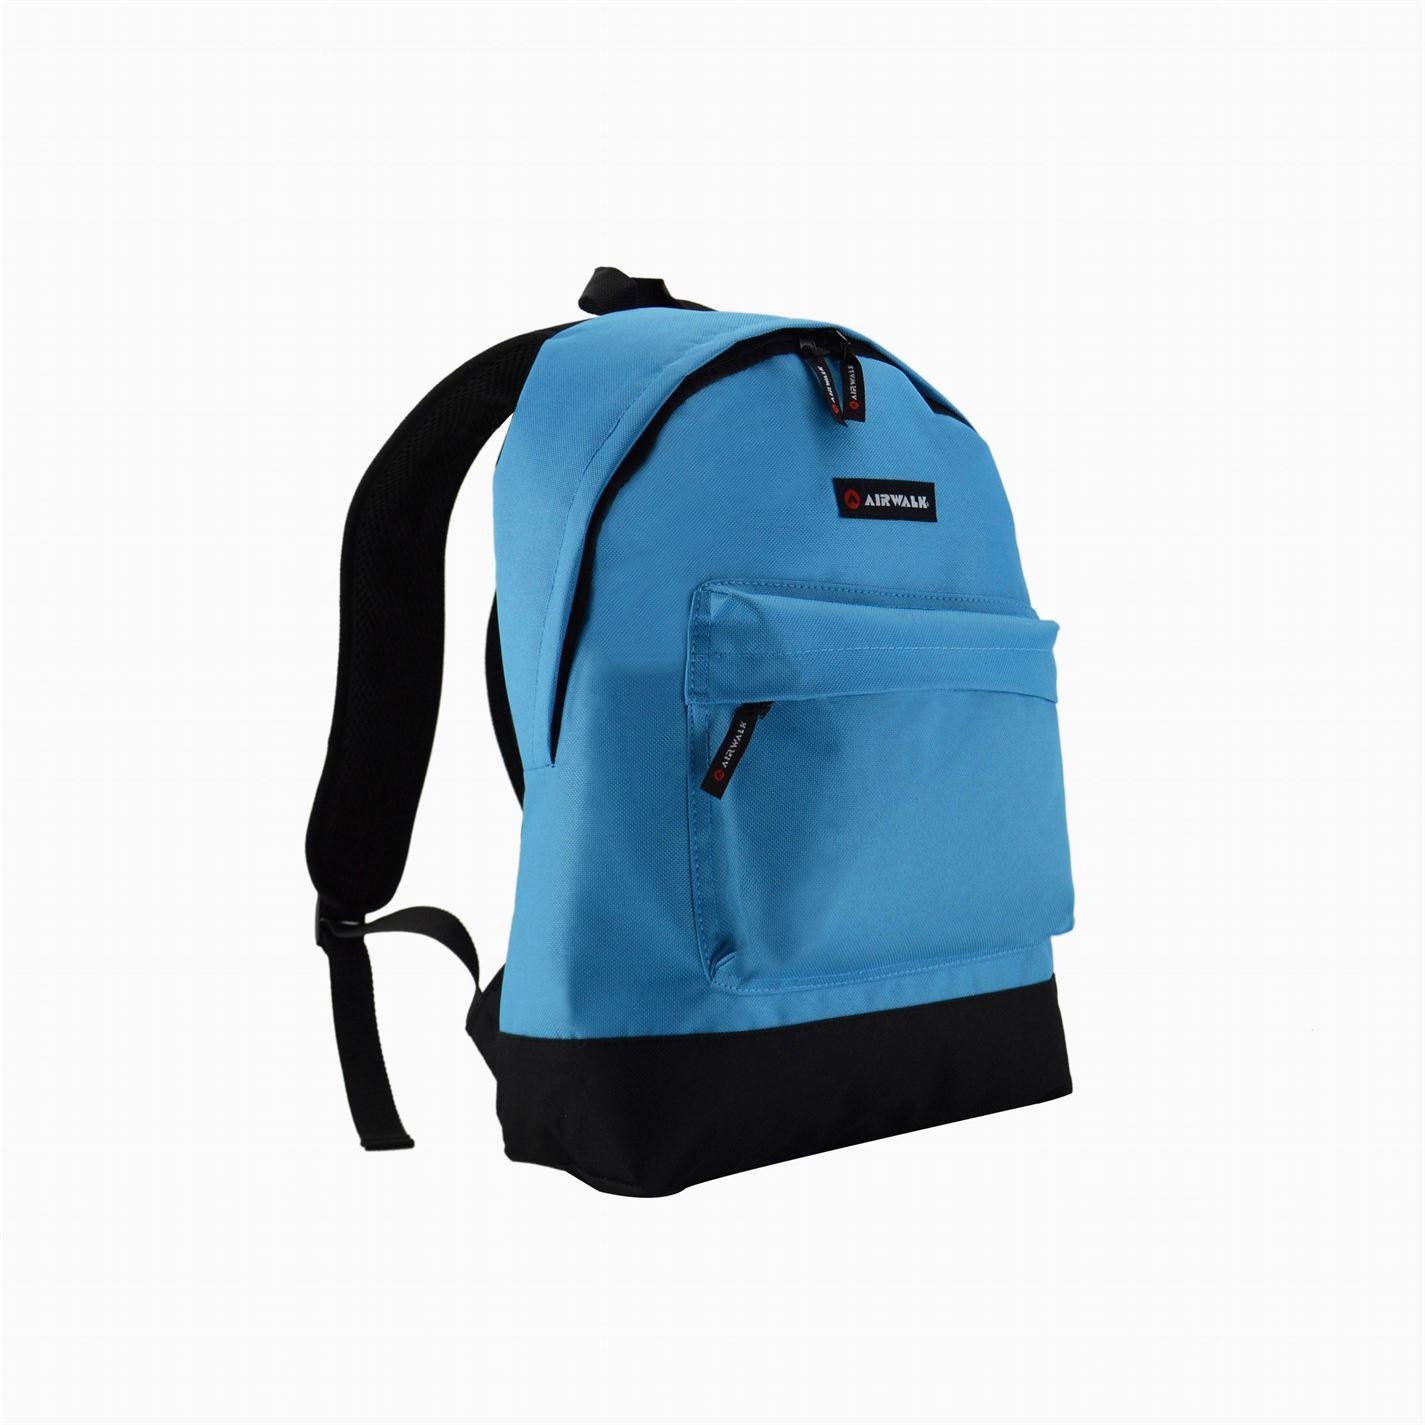 897960aa55 Sports Direct School Bags Adidas